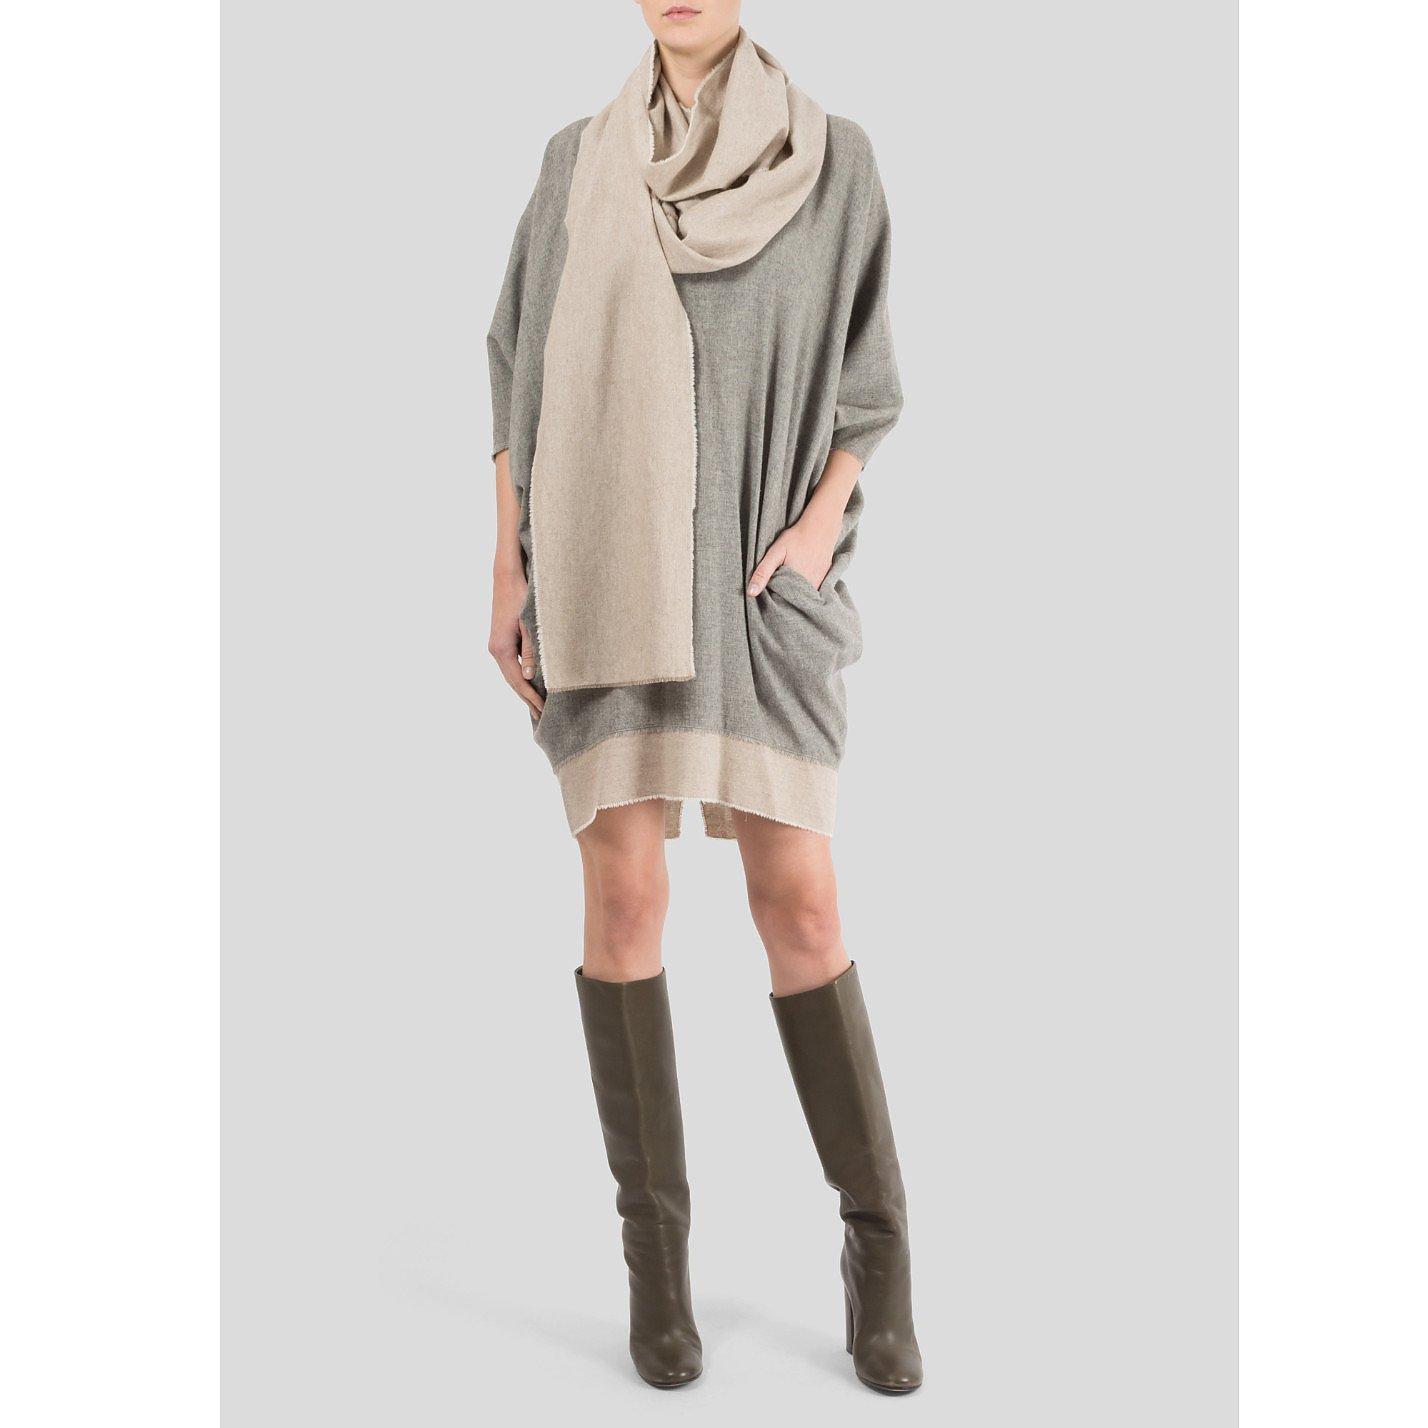 Victoria Beckham Sweater Dress With Scarf